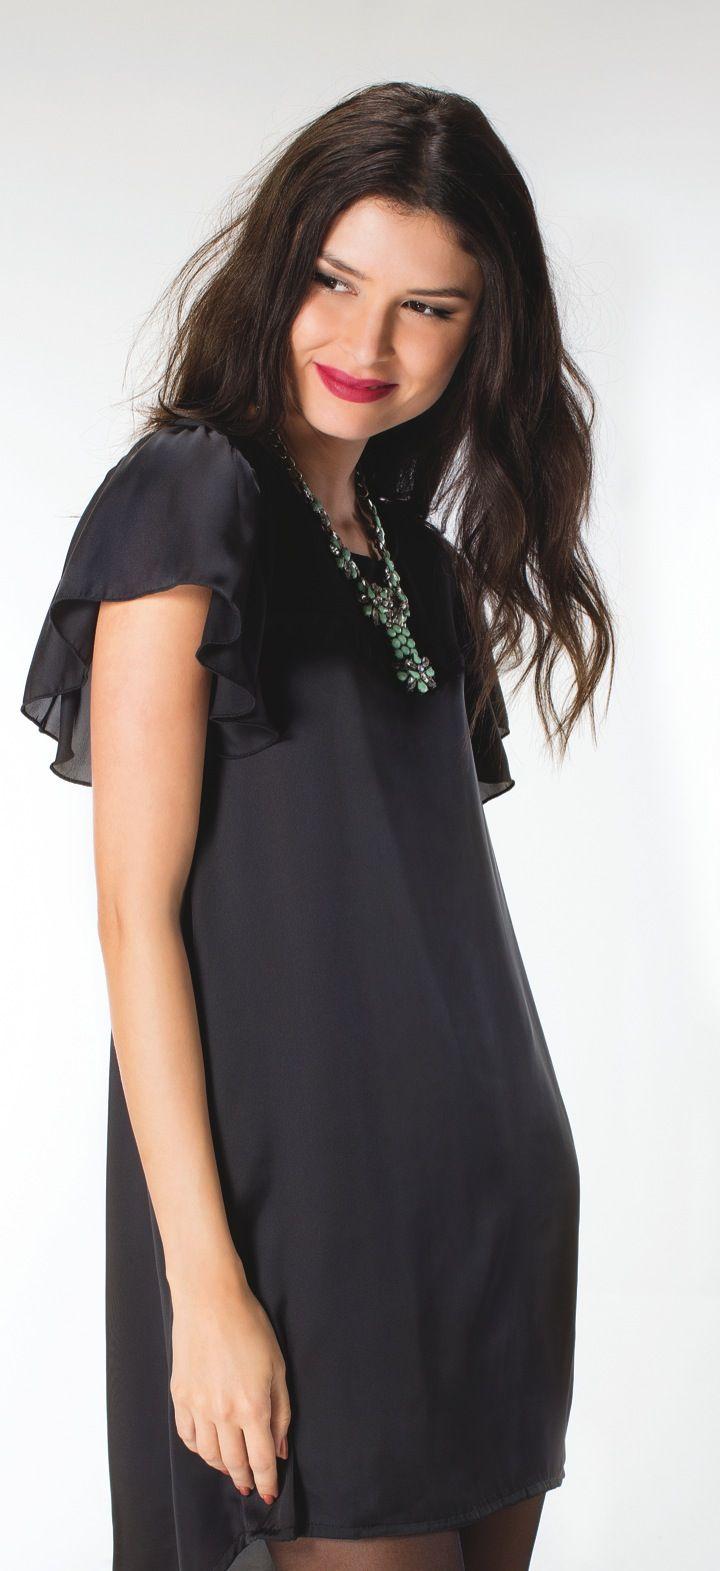 Emerald! #emerald #MO #fashion #style @strandbulgaria http://bit.ly/MOComing